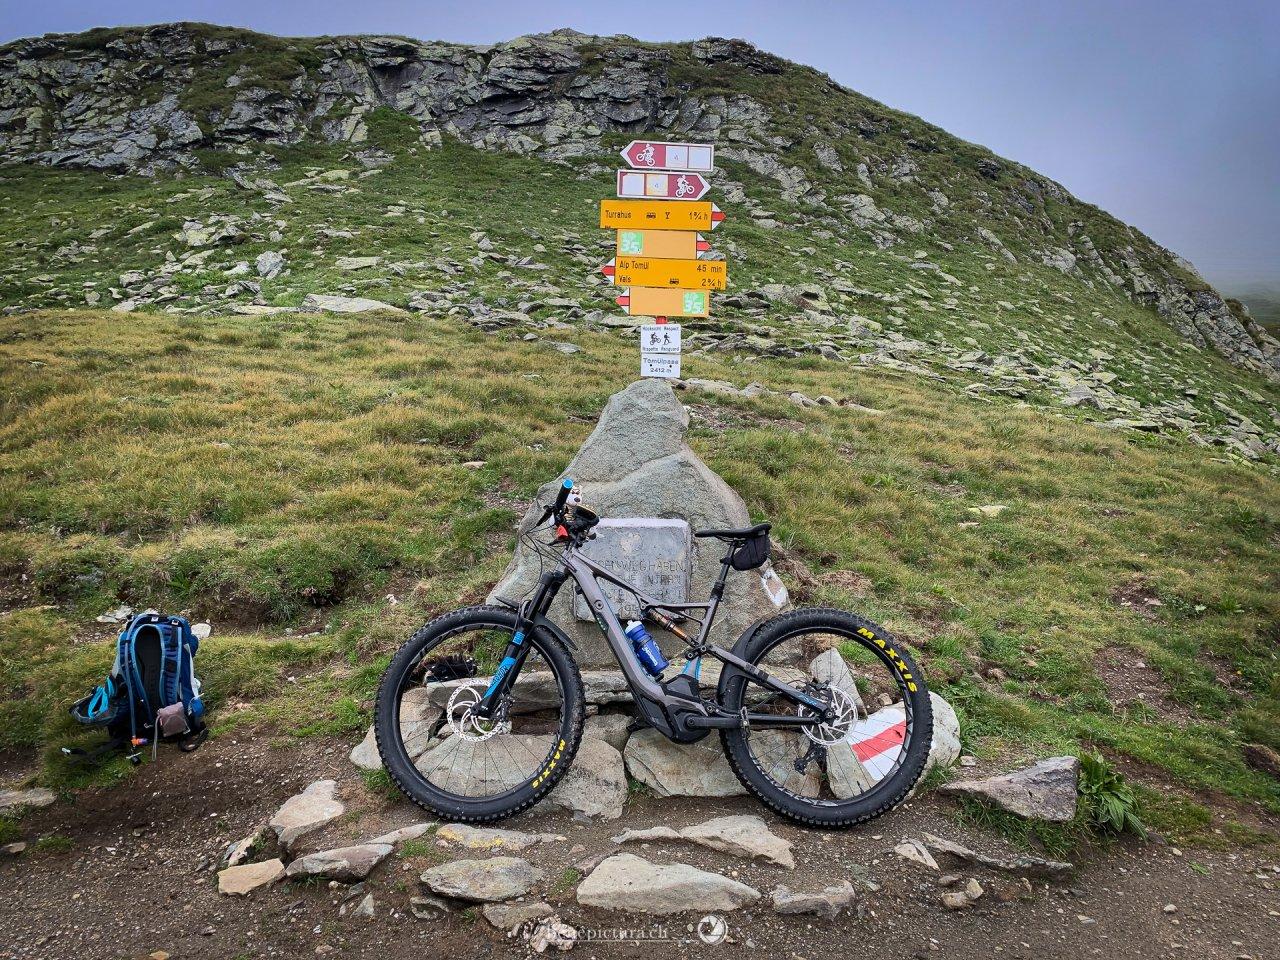 18_Graubünden Bike 90_Thalkirch_20190813.jpg